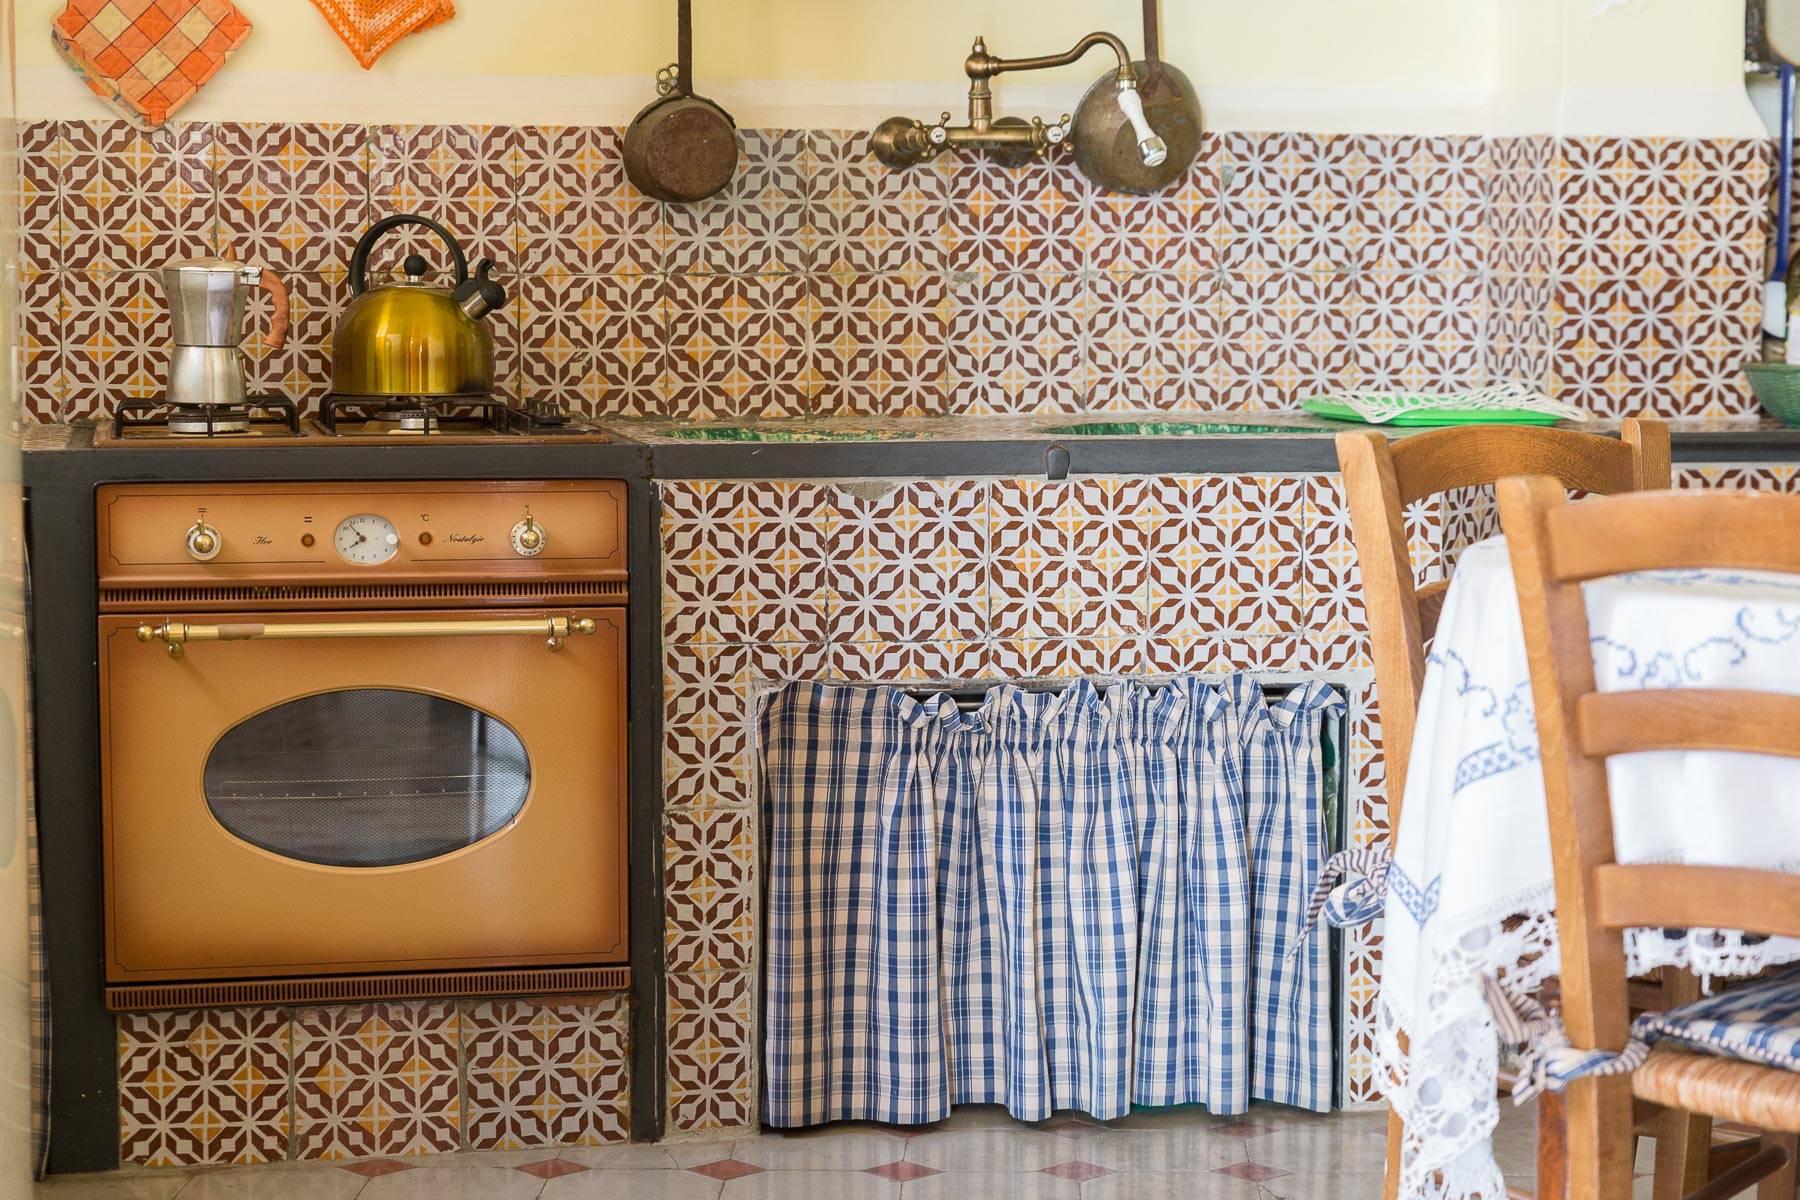 Casa indipendente in Vendita a Noto: 5 locali, 280 mq - Foto 25